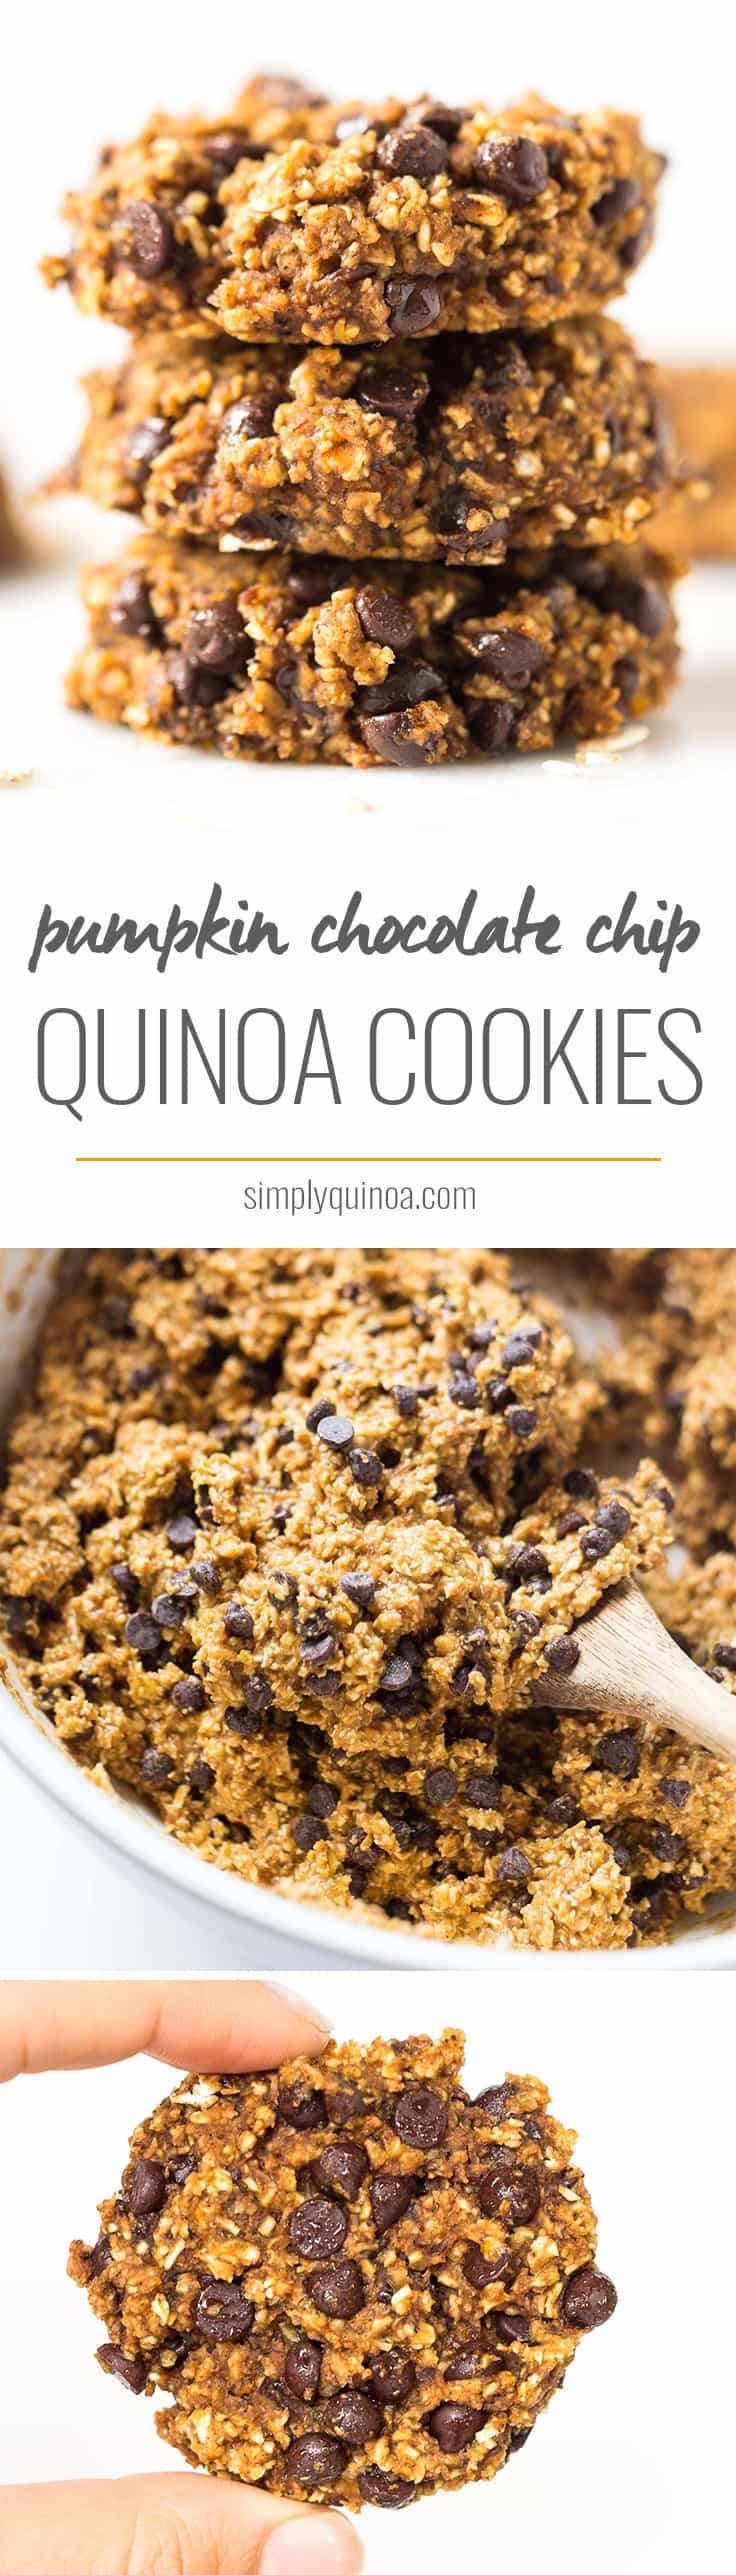 Pumpkin Chocolate Chip Quinoa Cookies - Simply Quinoa